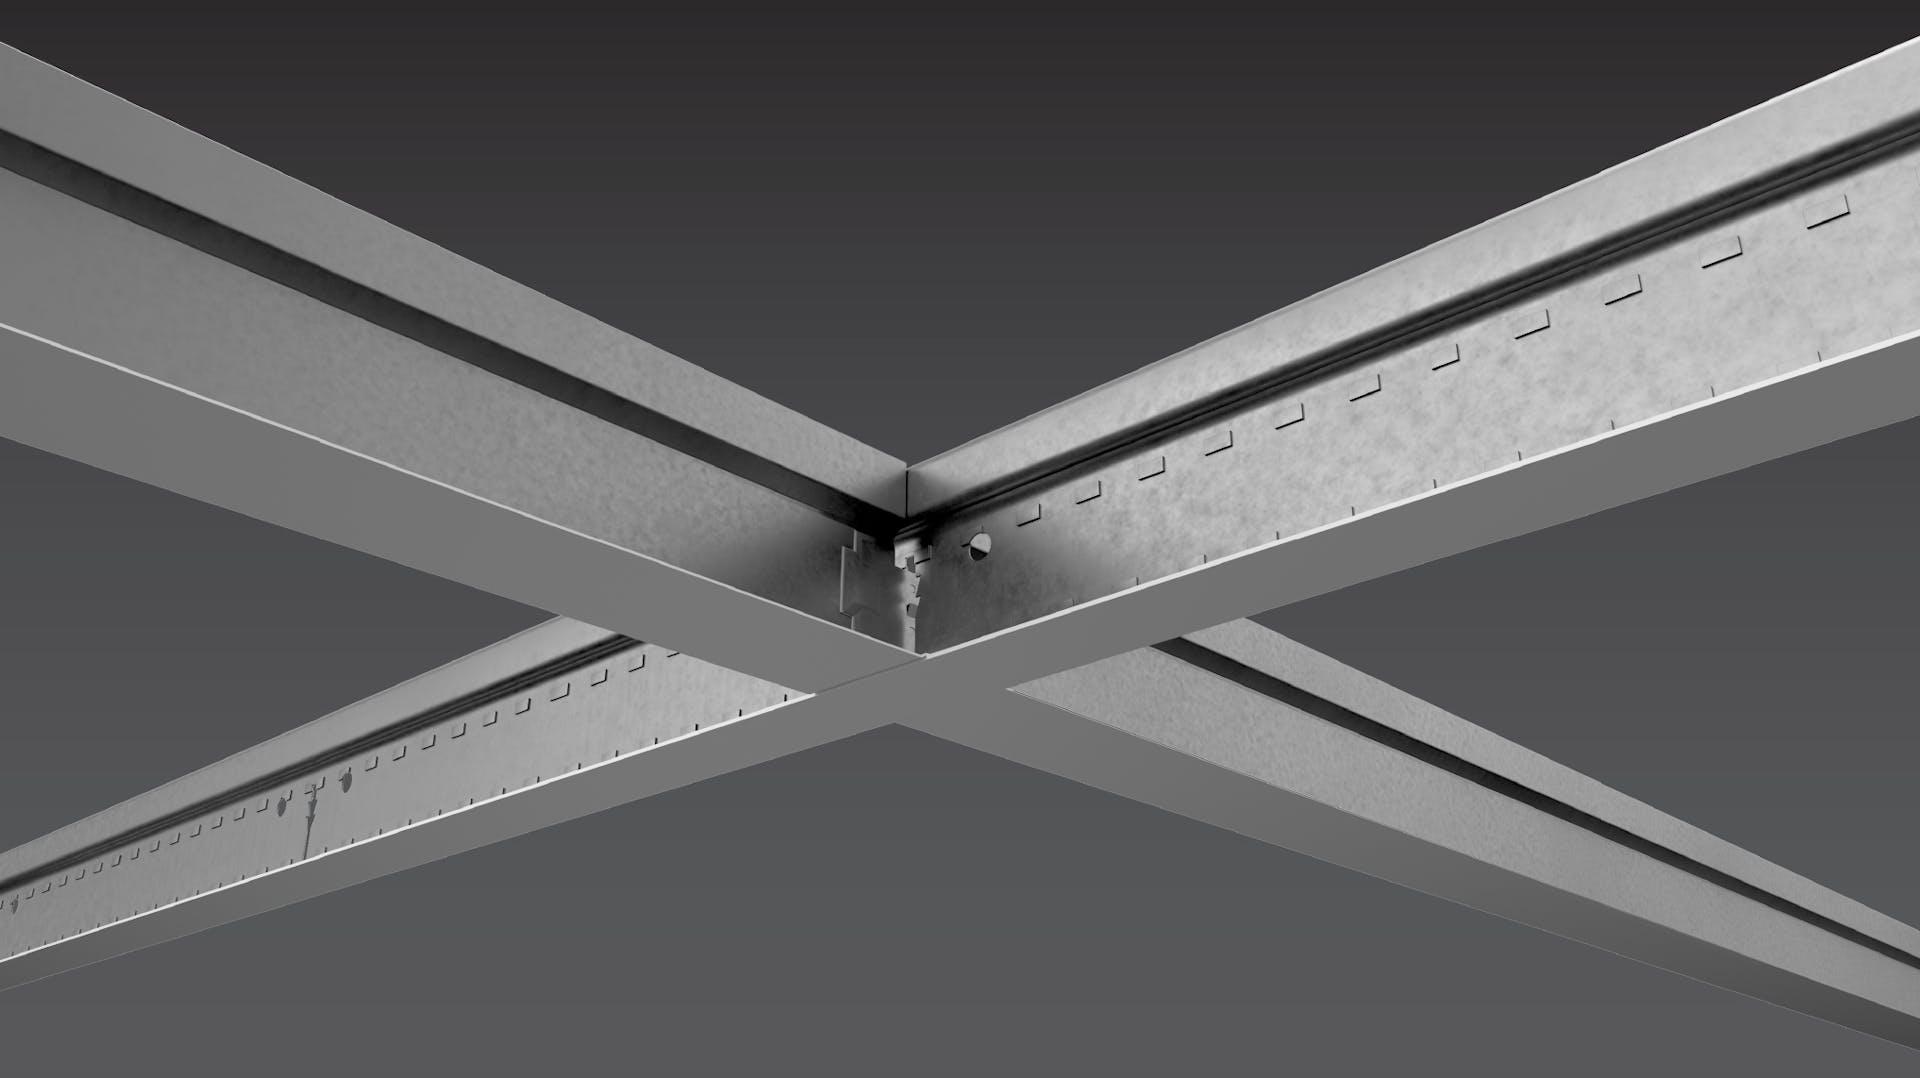 NA, Suspension System, Grid, Chicago Metallic, 200 Snap Grid